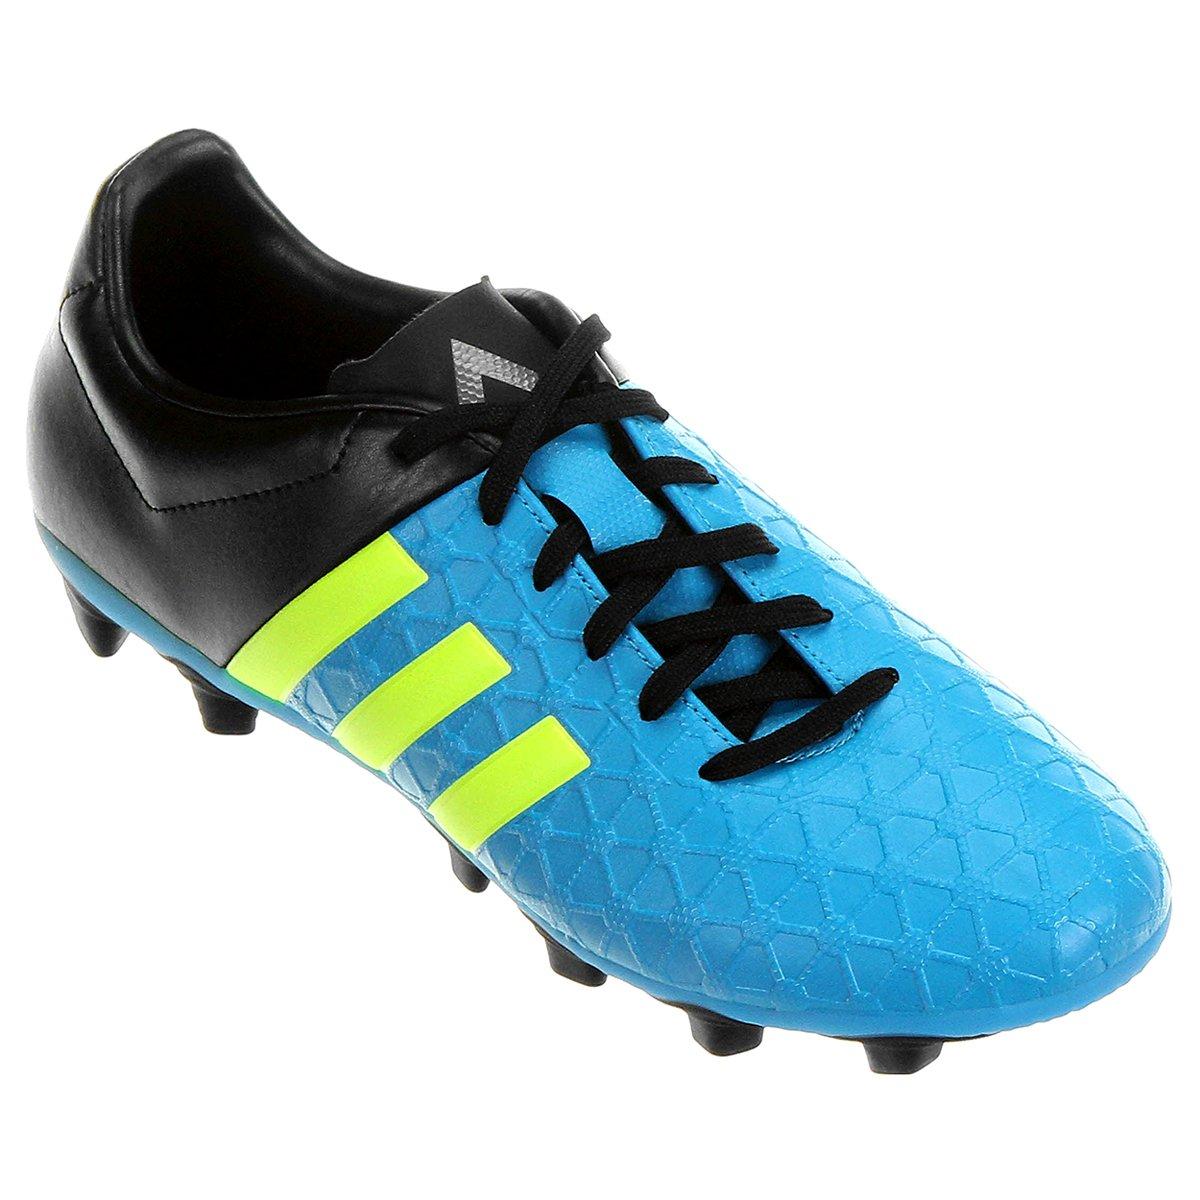 52158e5c86 Chuteira Adidas Ace 15 4 FXG Campo